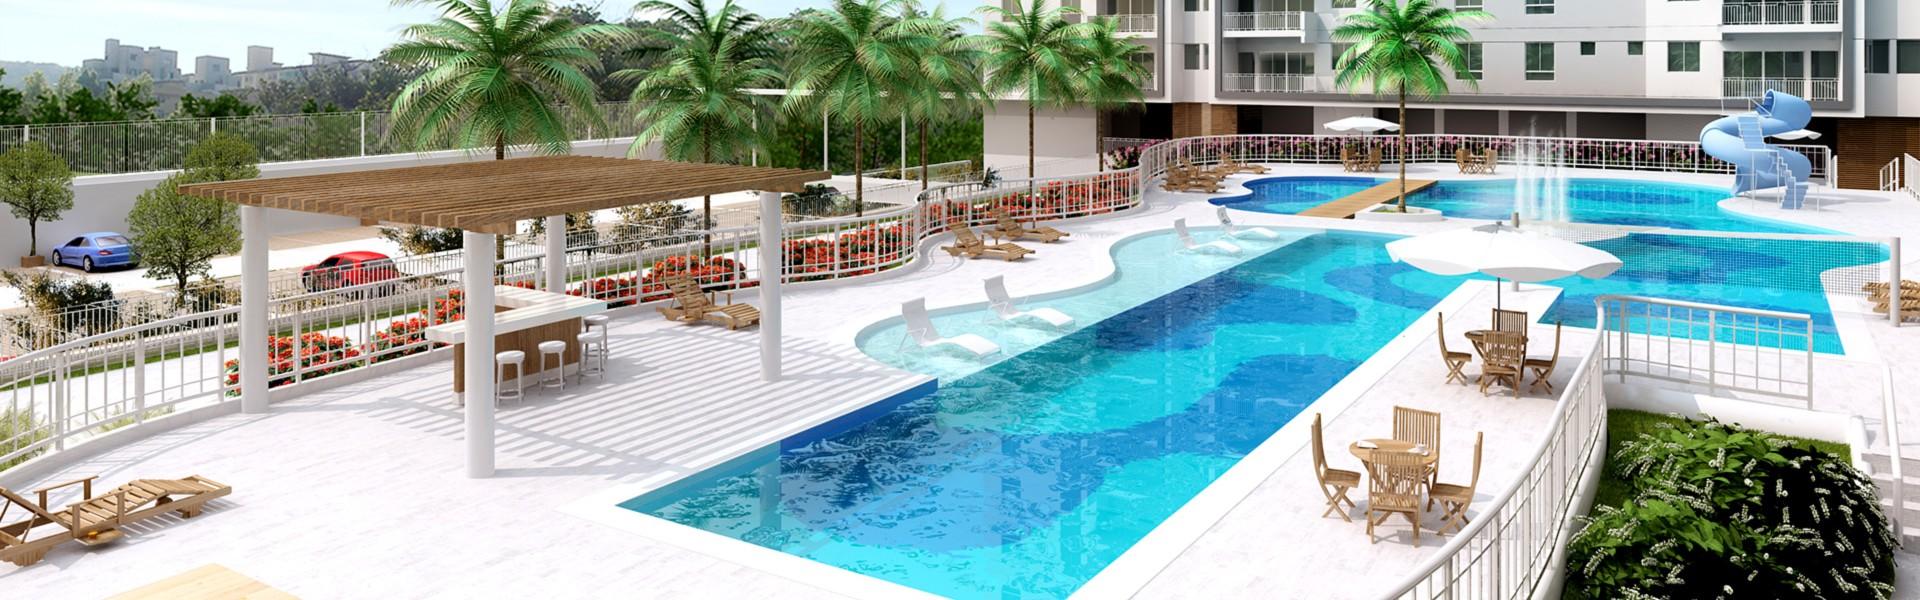 Aqua Clube Residencial